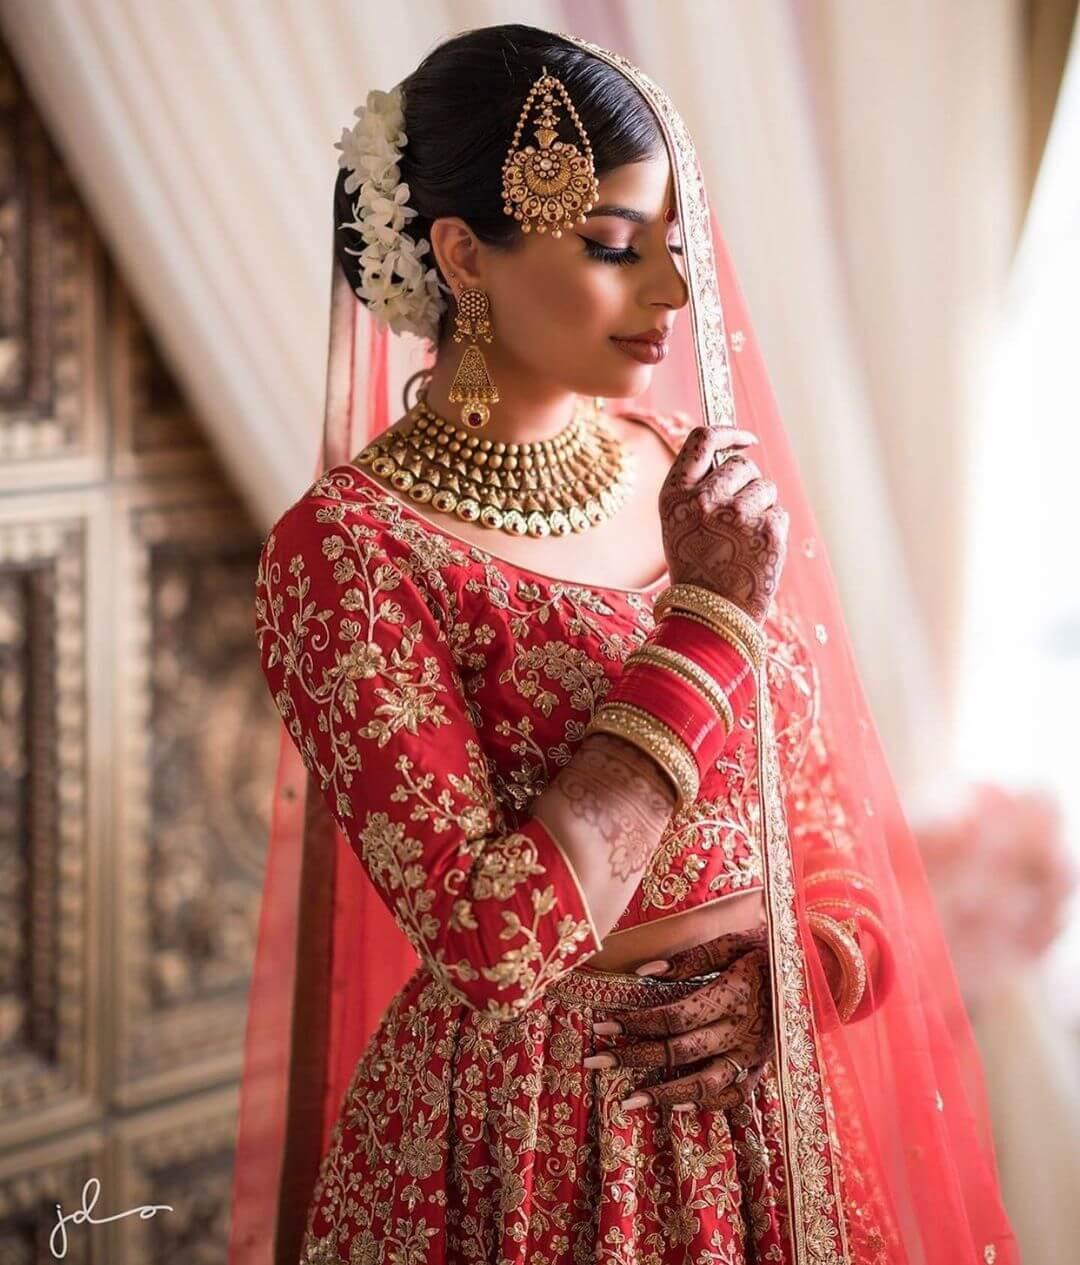 Antique Patch Look Passa/Jhoomar Designs For Muslim Bride